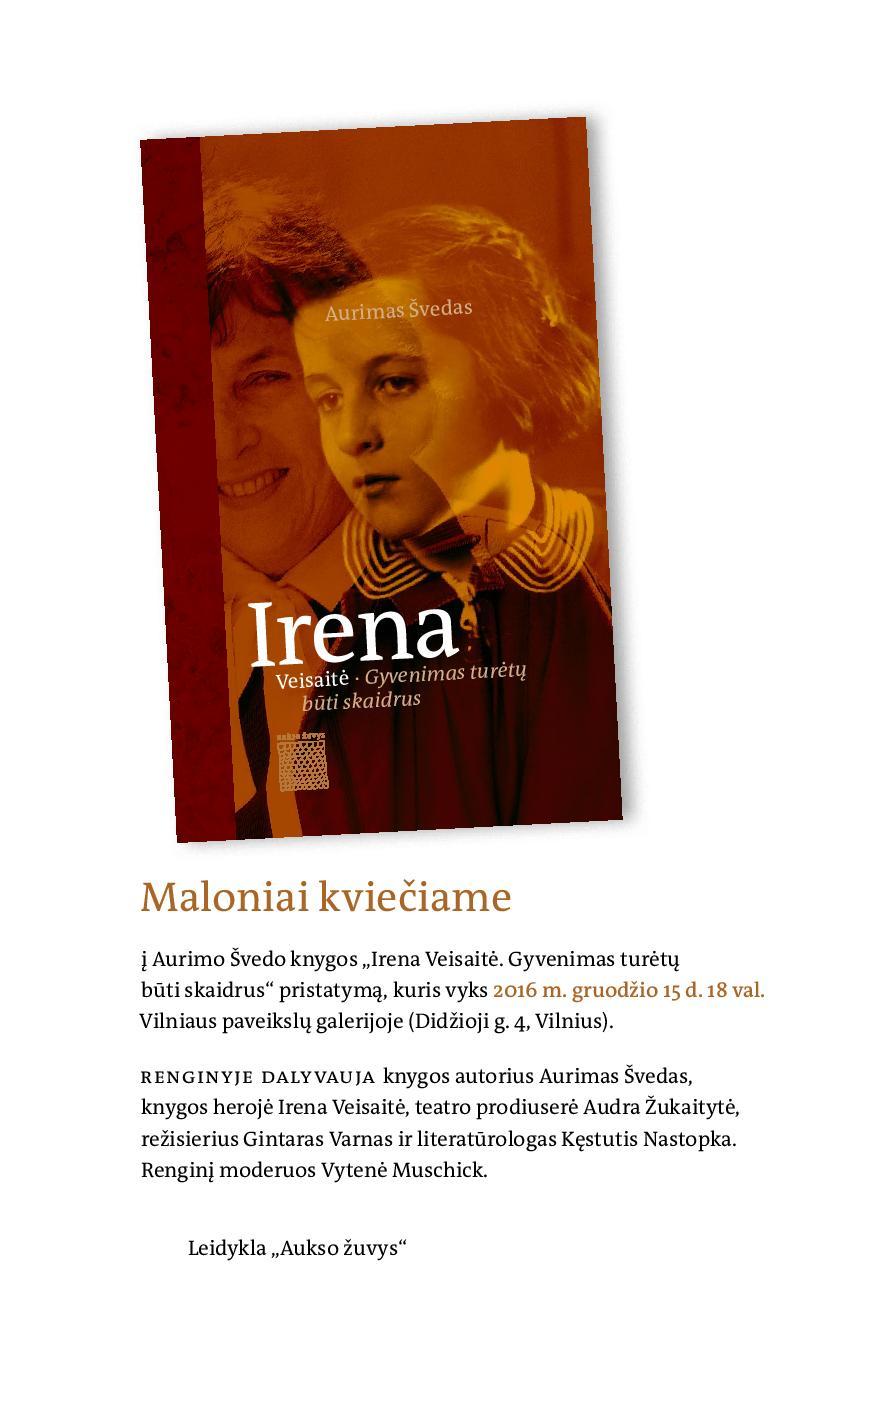 http://www.ldm.lt/wp-content/uploads/2016/12/Irena_kvietimas-page.jpg